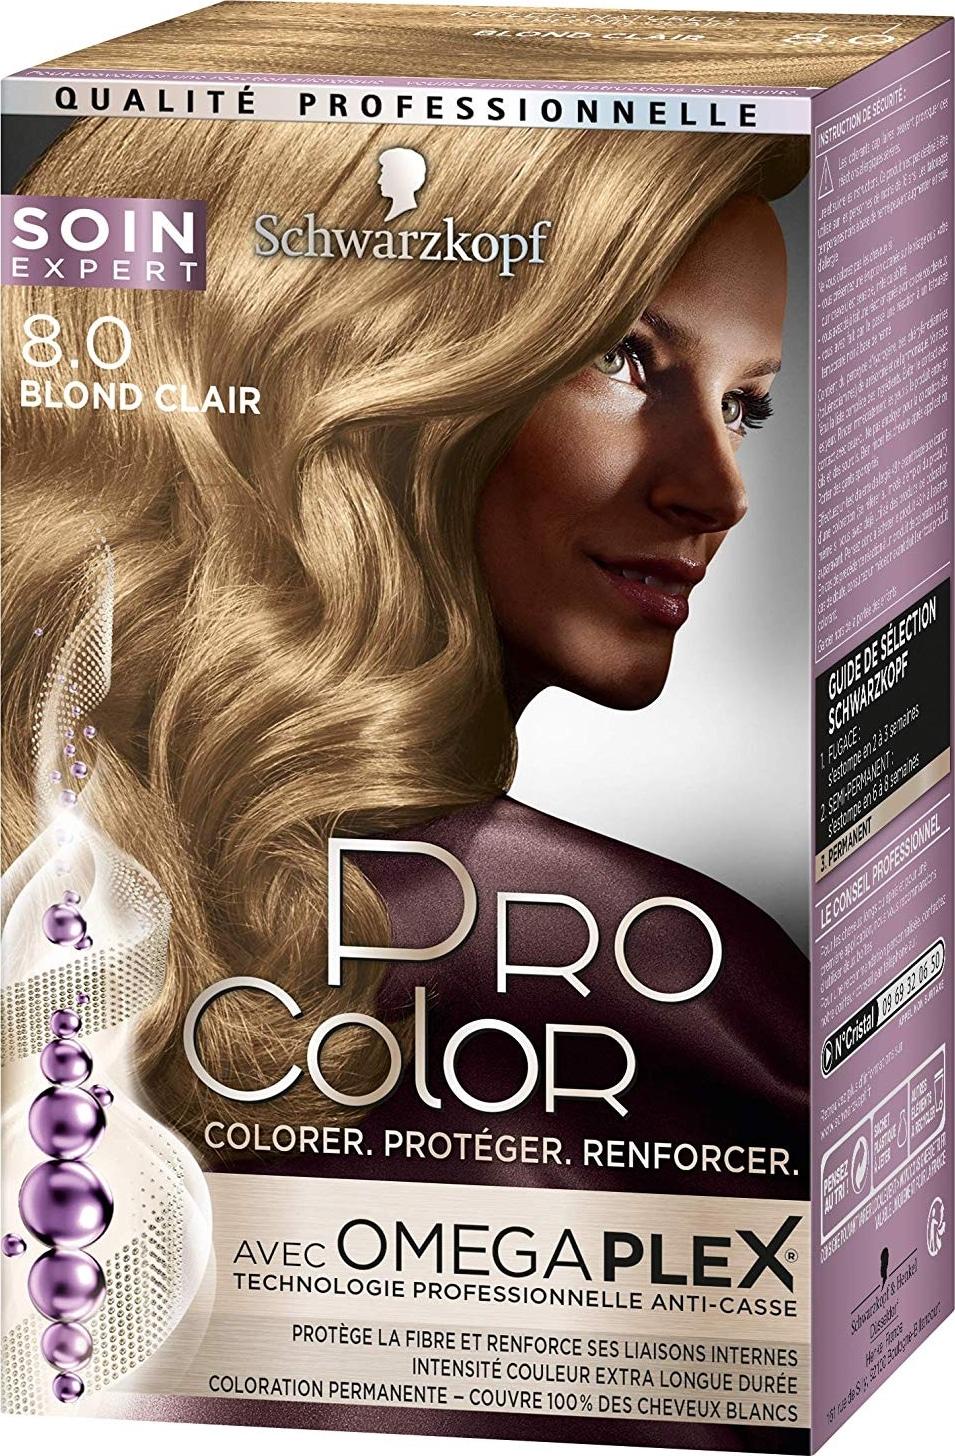 Coloration Schwarzkopf Pro Color